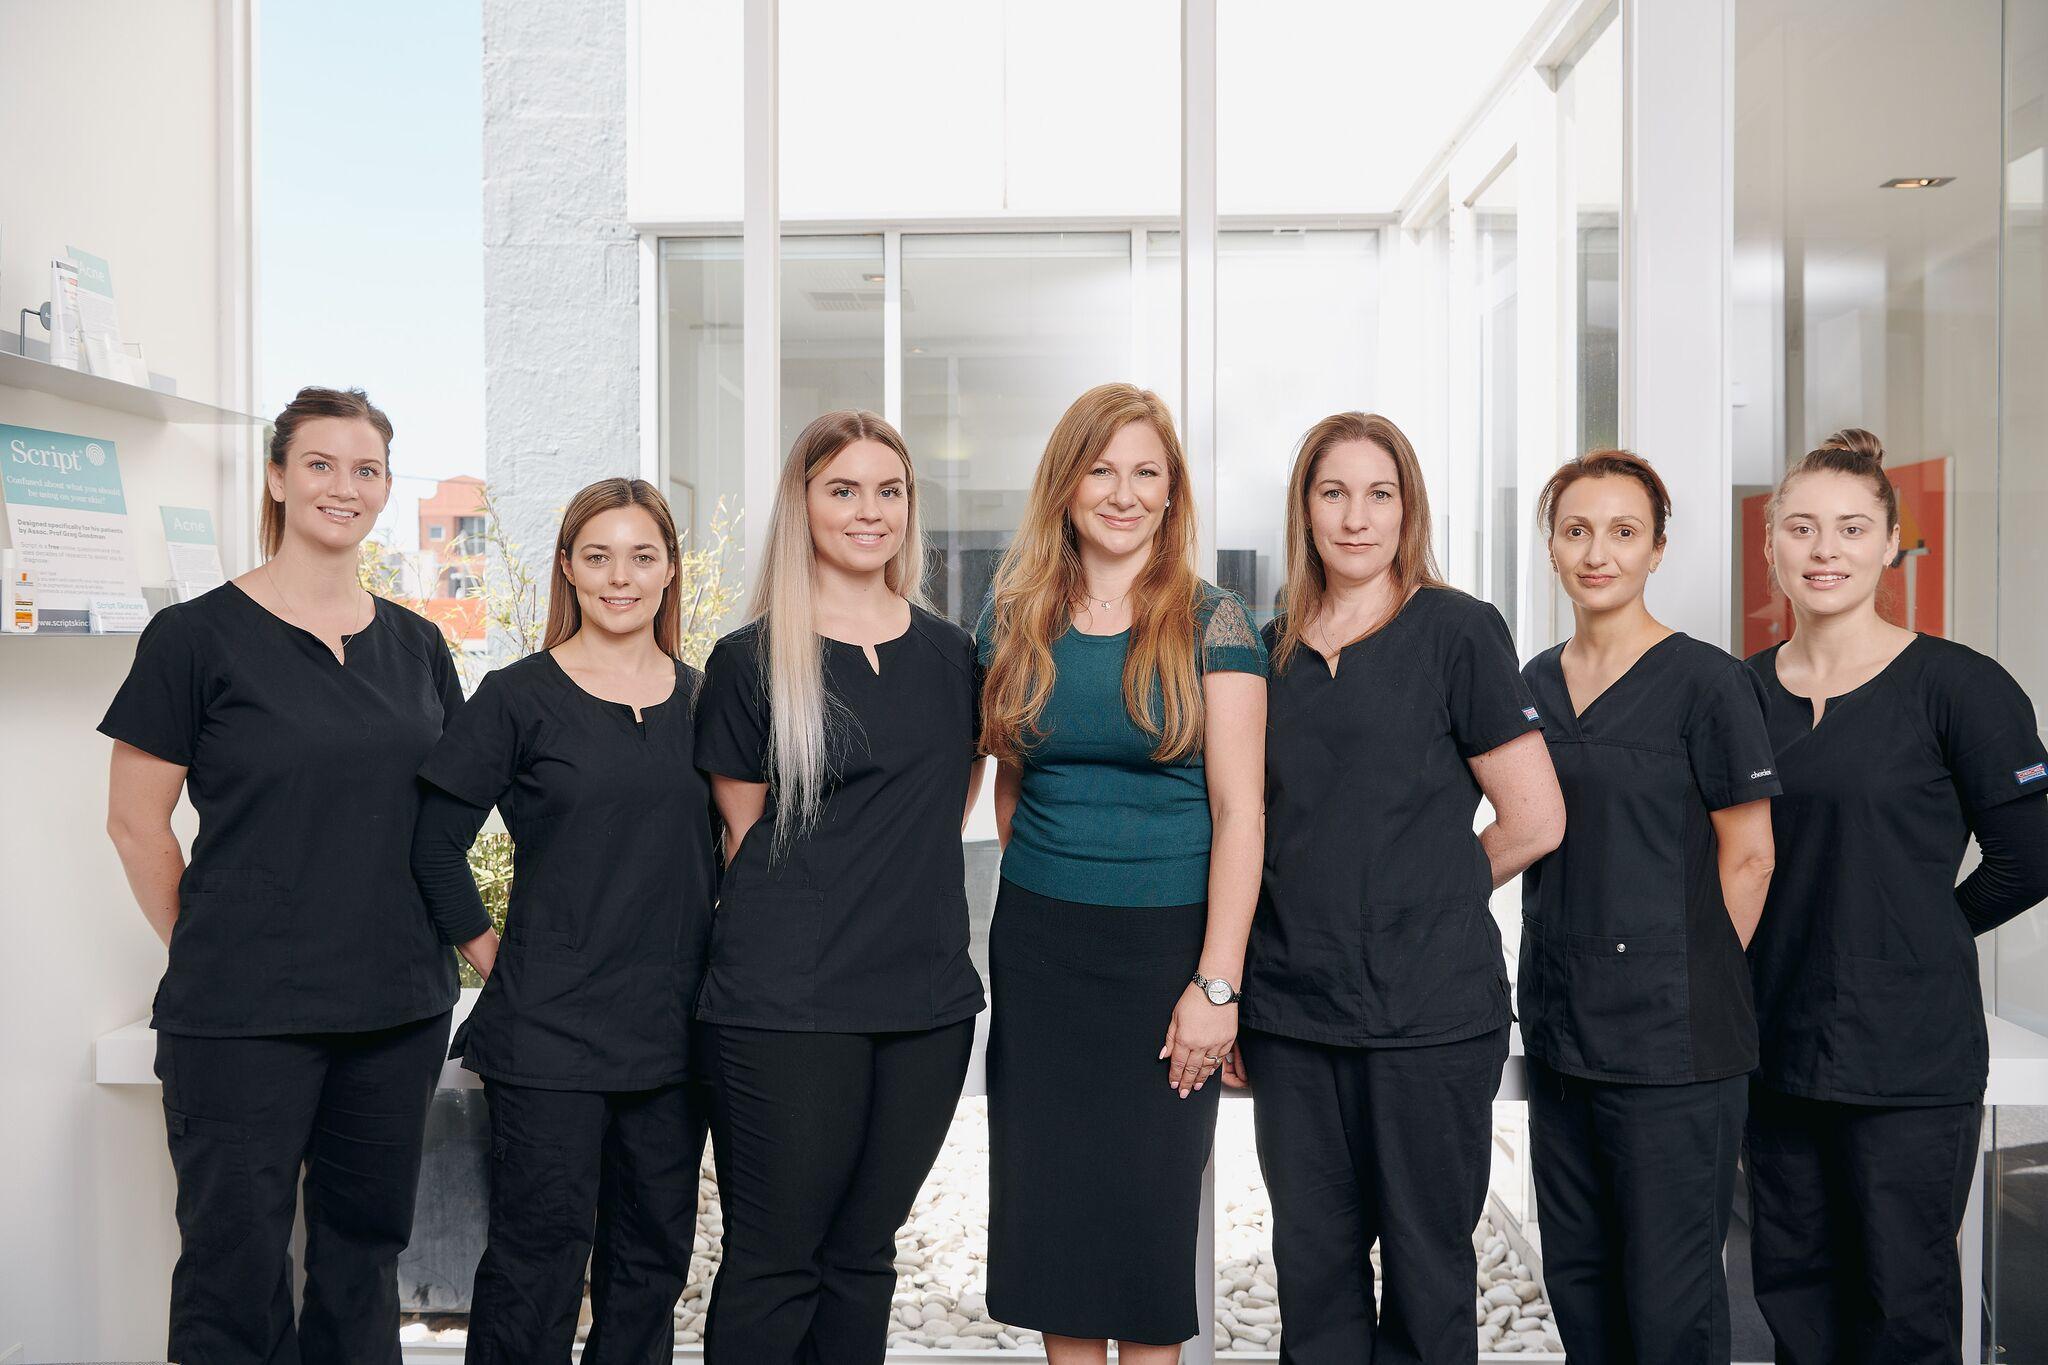 Practice Nursing Team